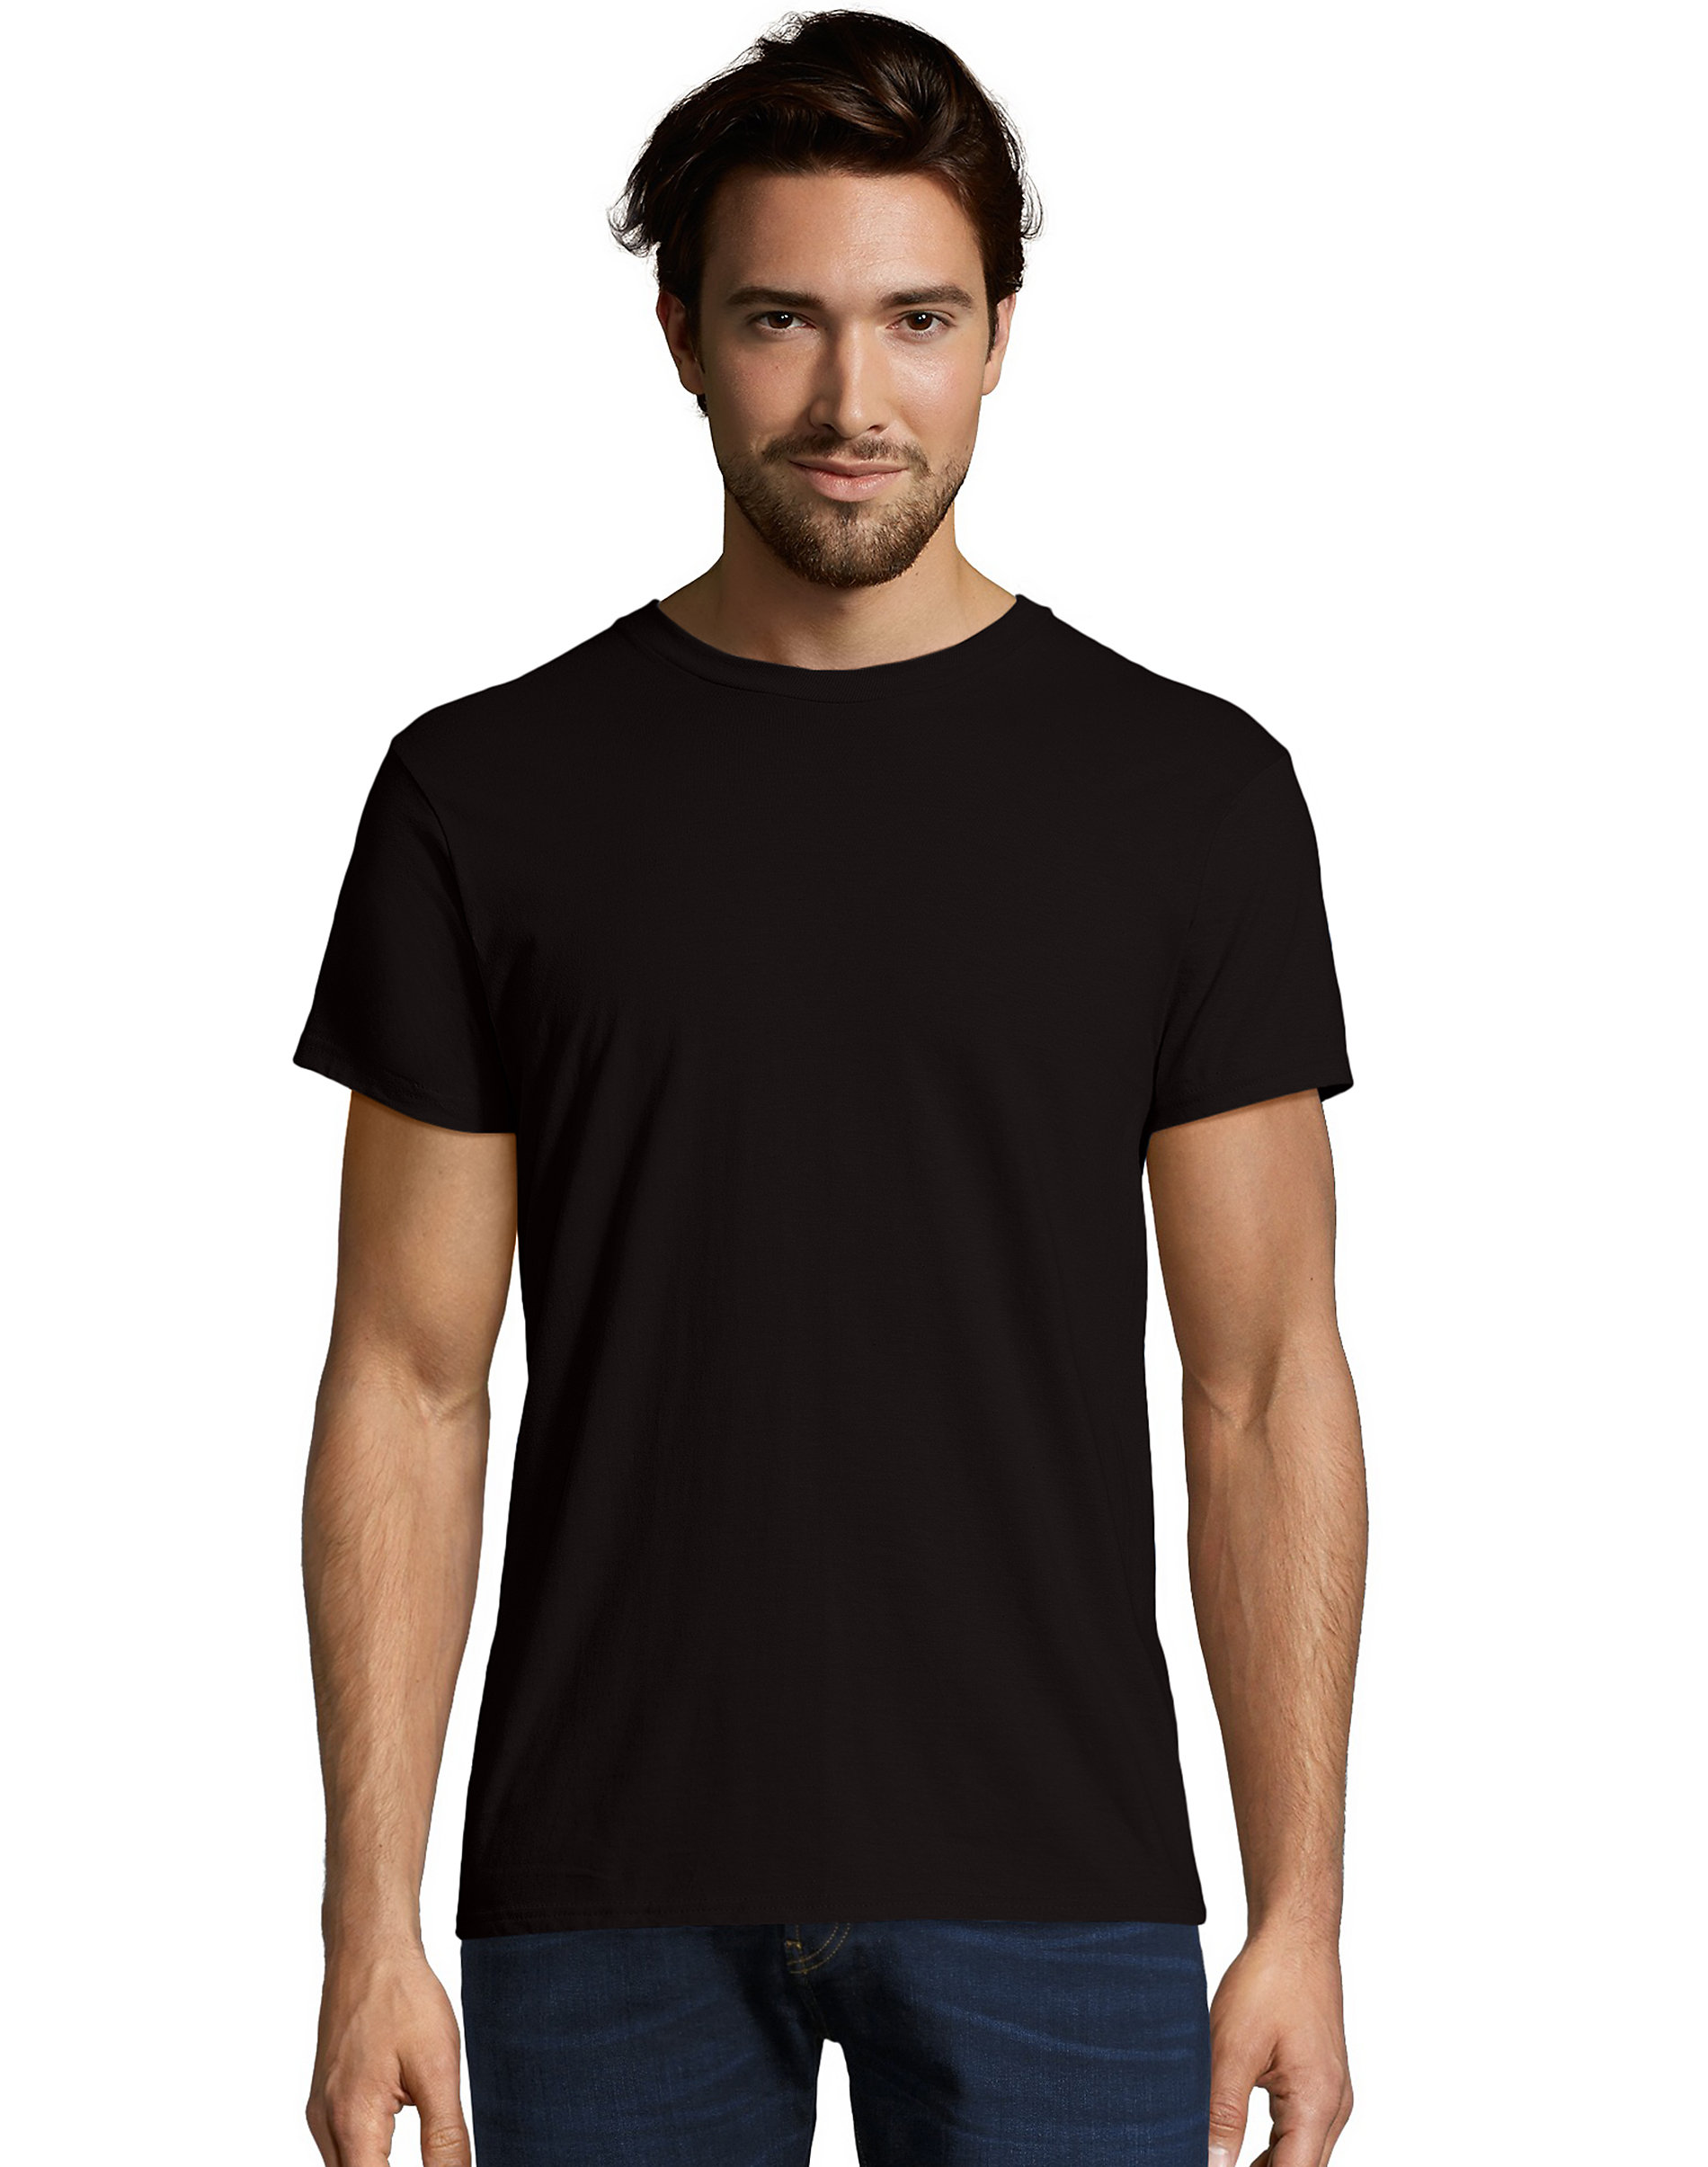 Nano-T-shirt_Smoke Grey_2XL para hombres dbmZrv